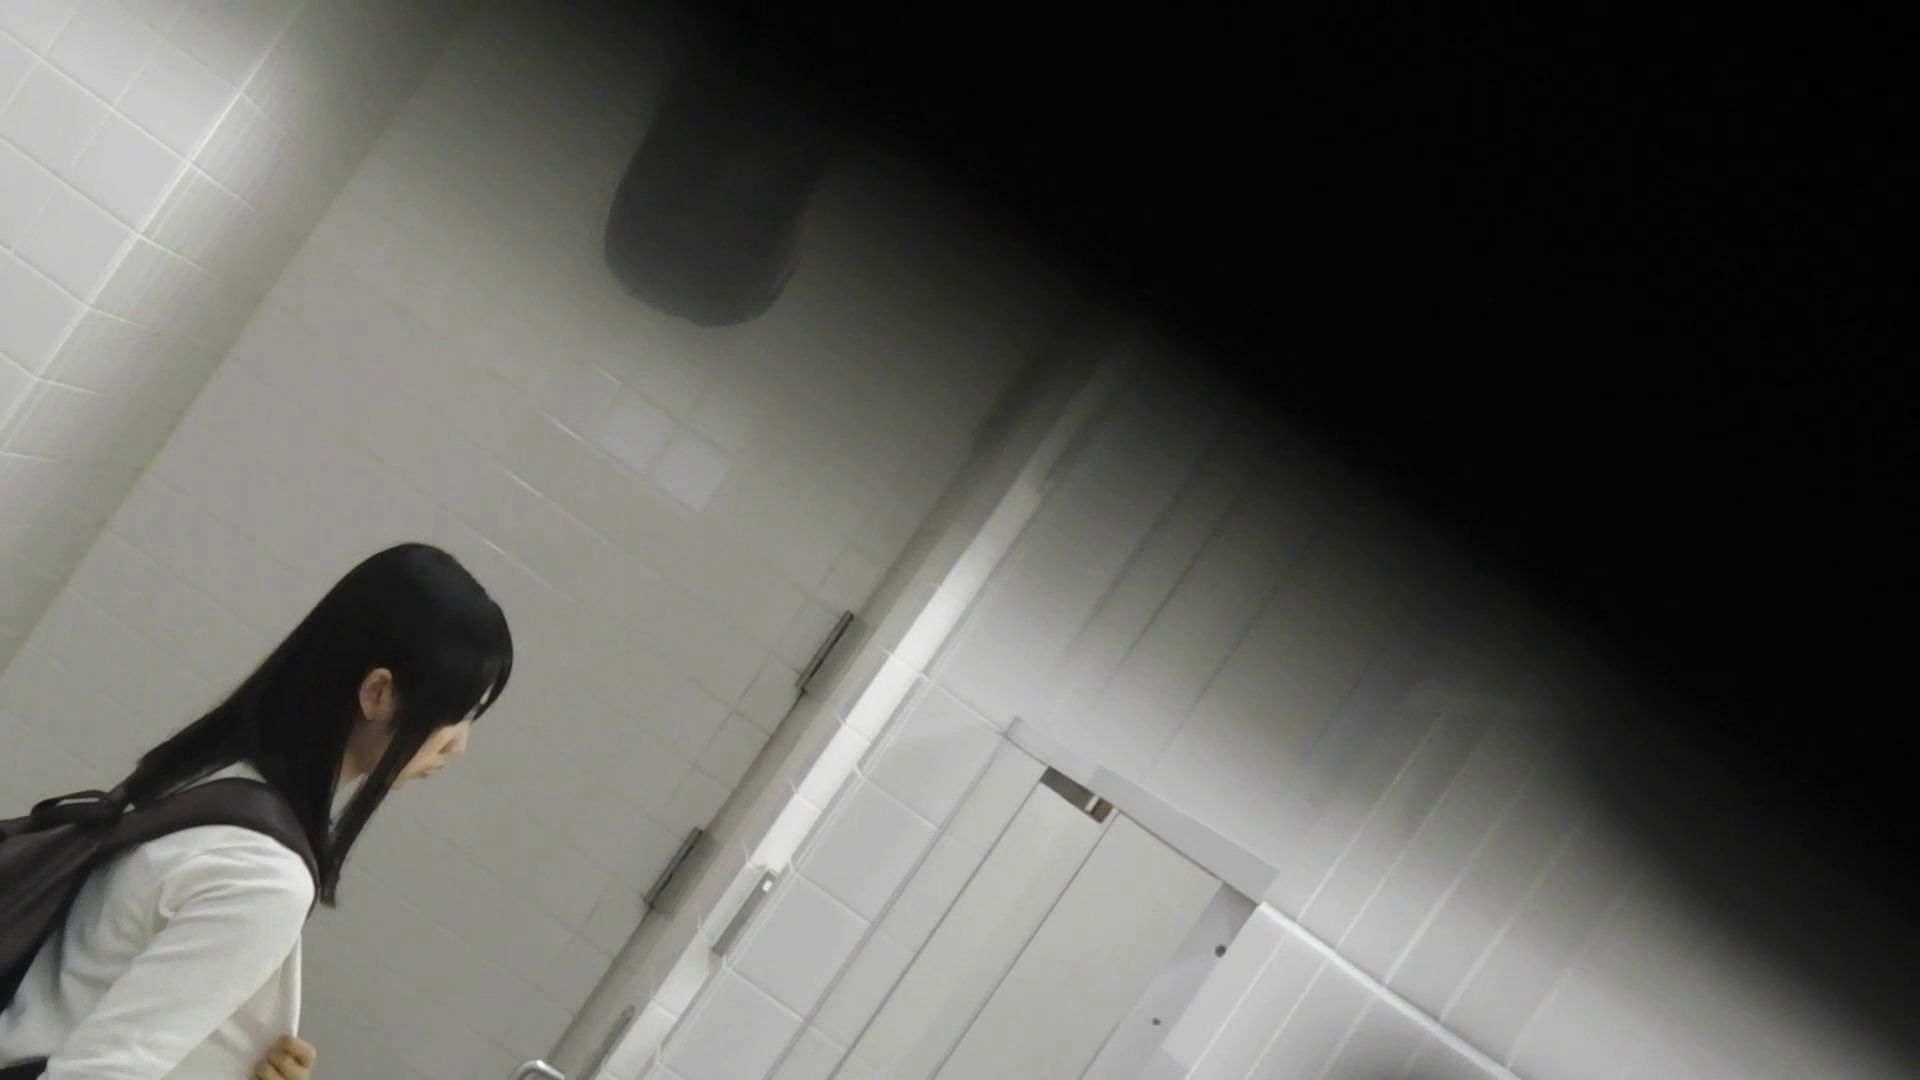 vol.21 命がけ潜伏洗面所! ナイスな和式バックショット 洗面所突入 戯れ無修正画像 102pic 94